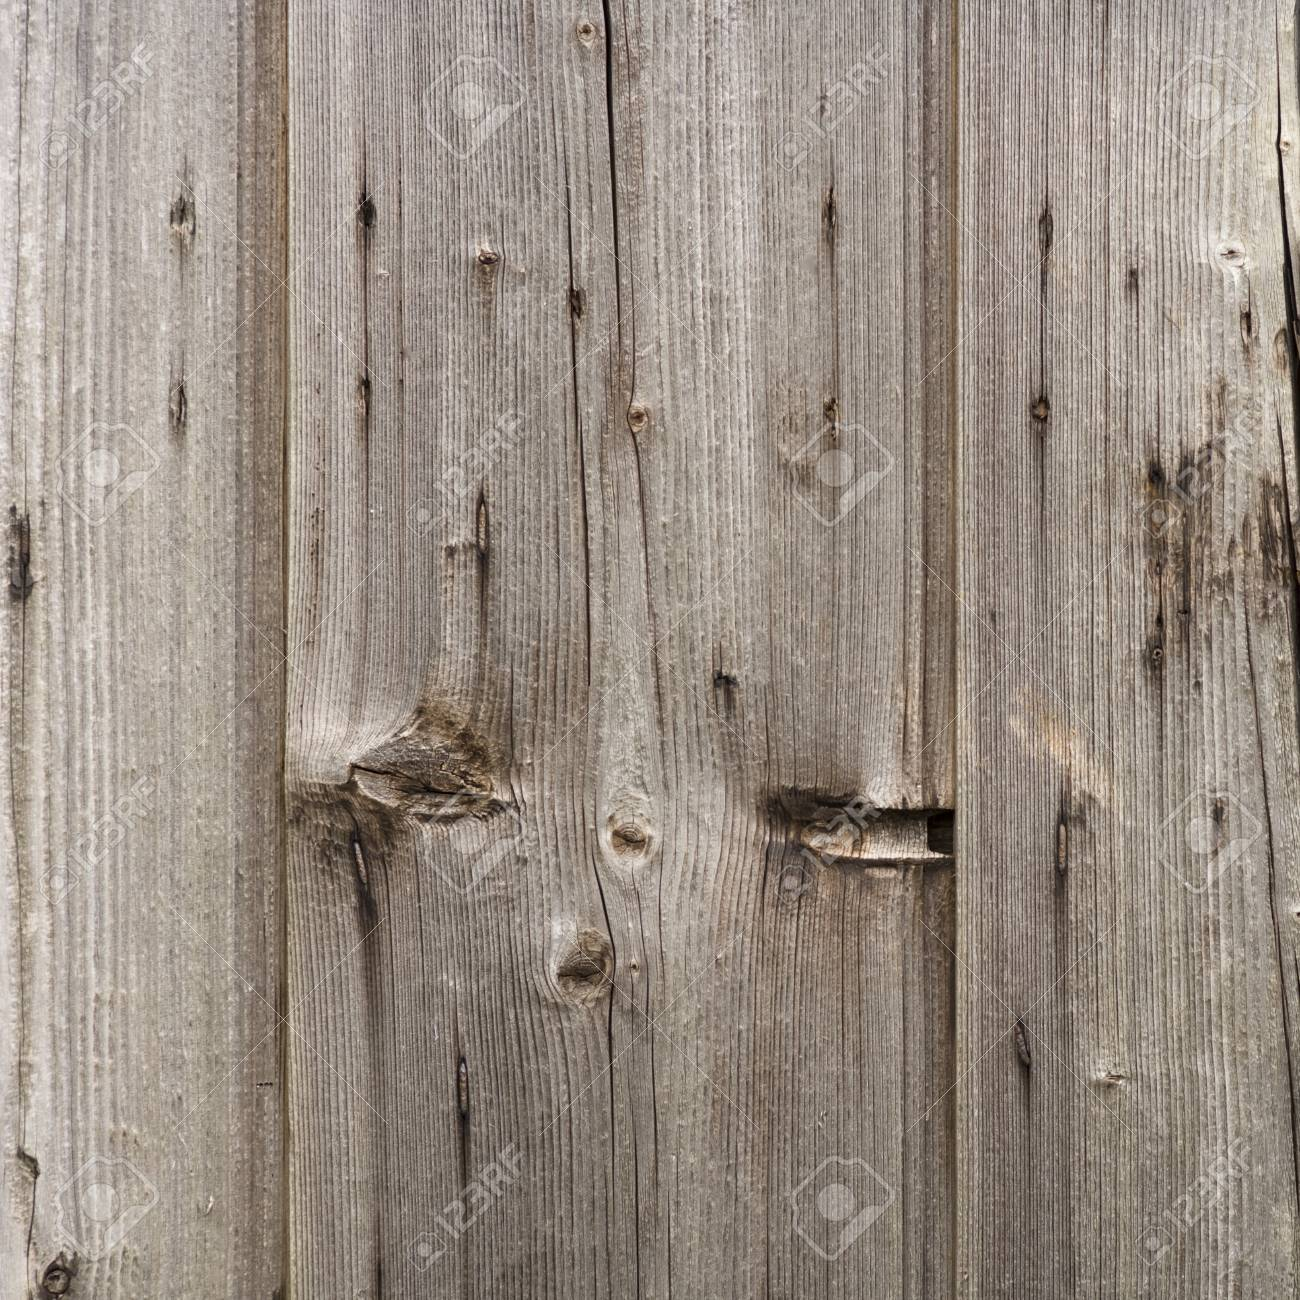 Old Wooden Exterior Door Full Frame Background Texture Stock Photo